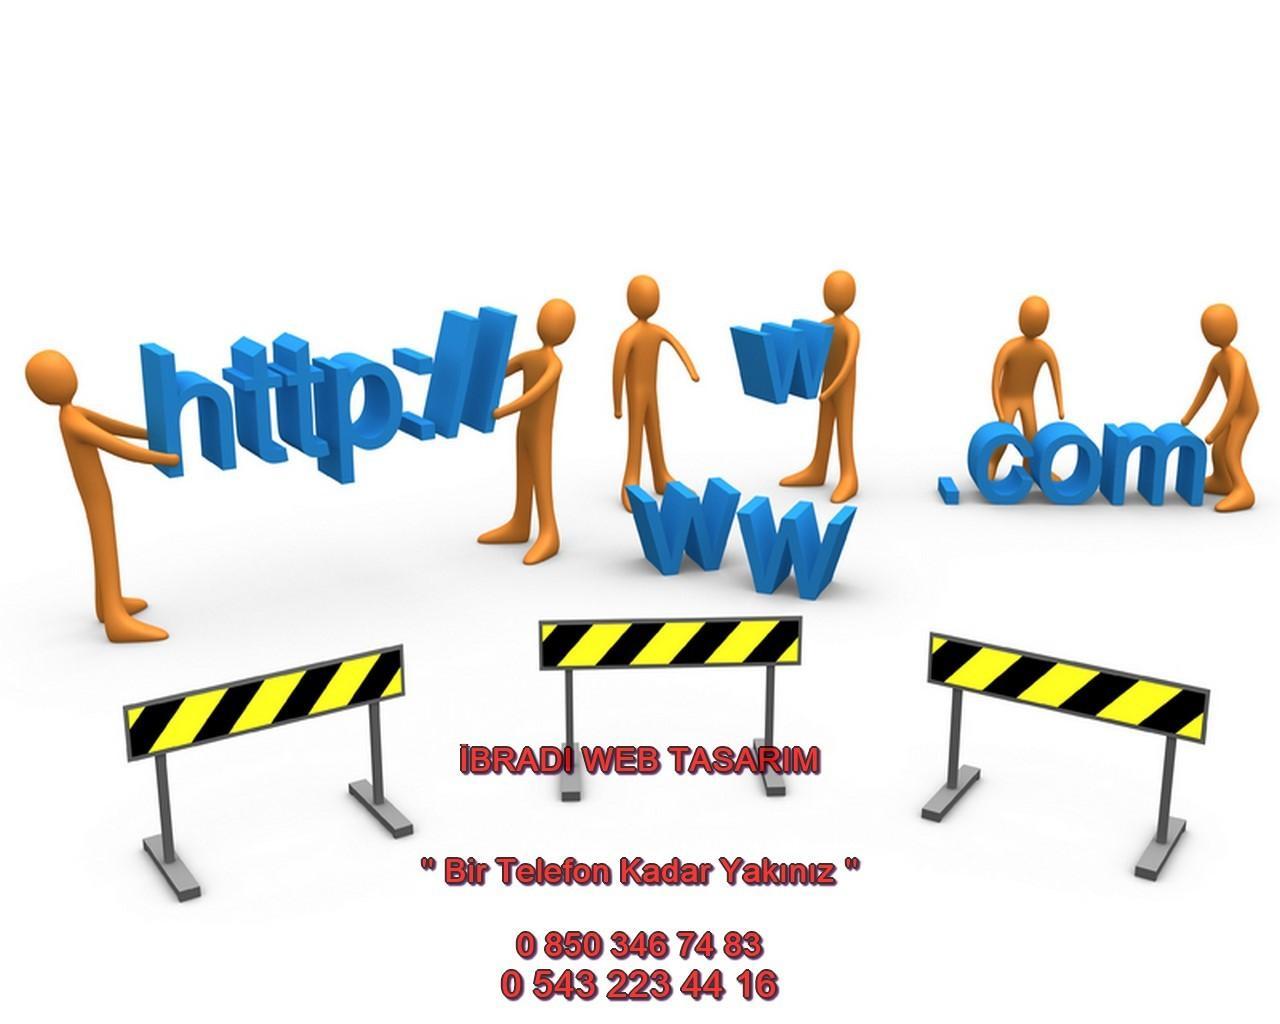 İbradi Web Tasarım